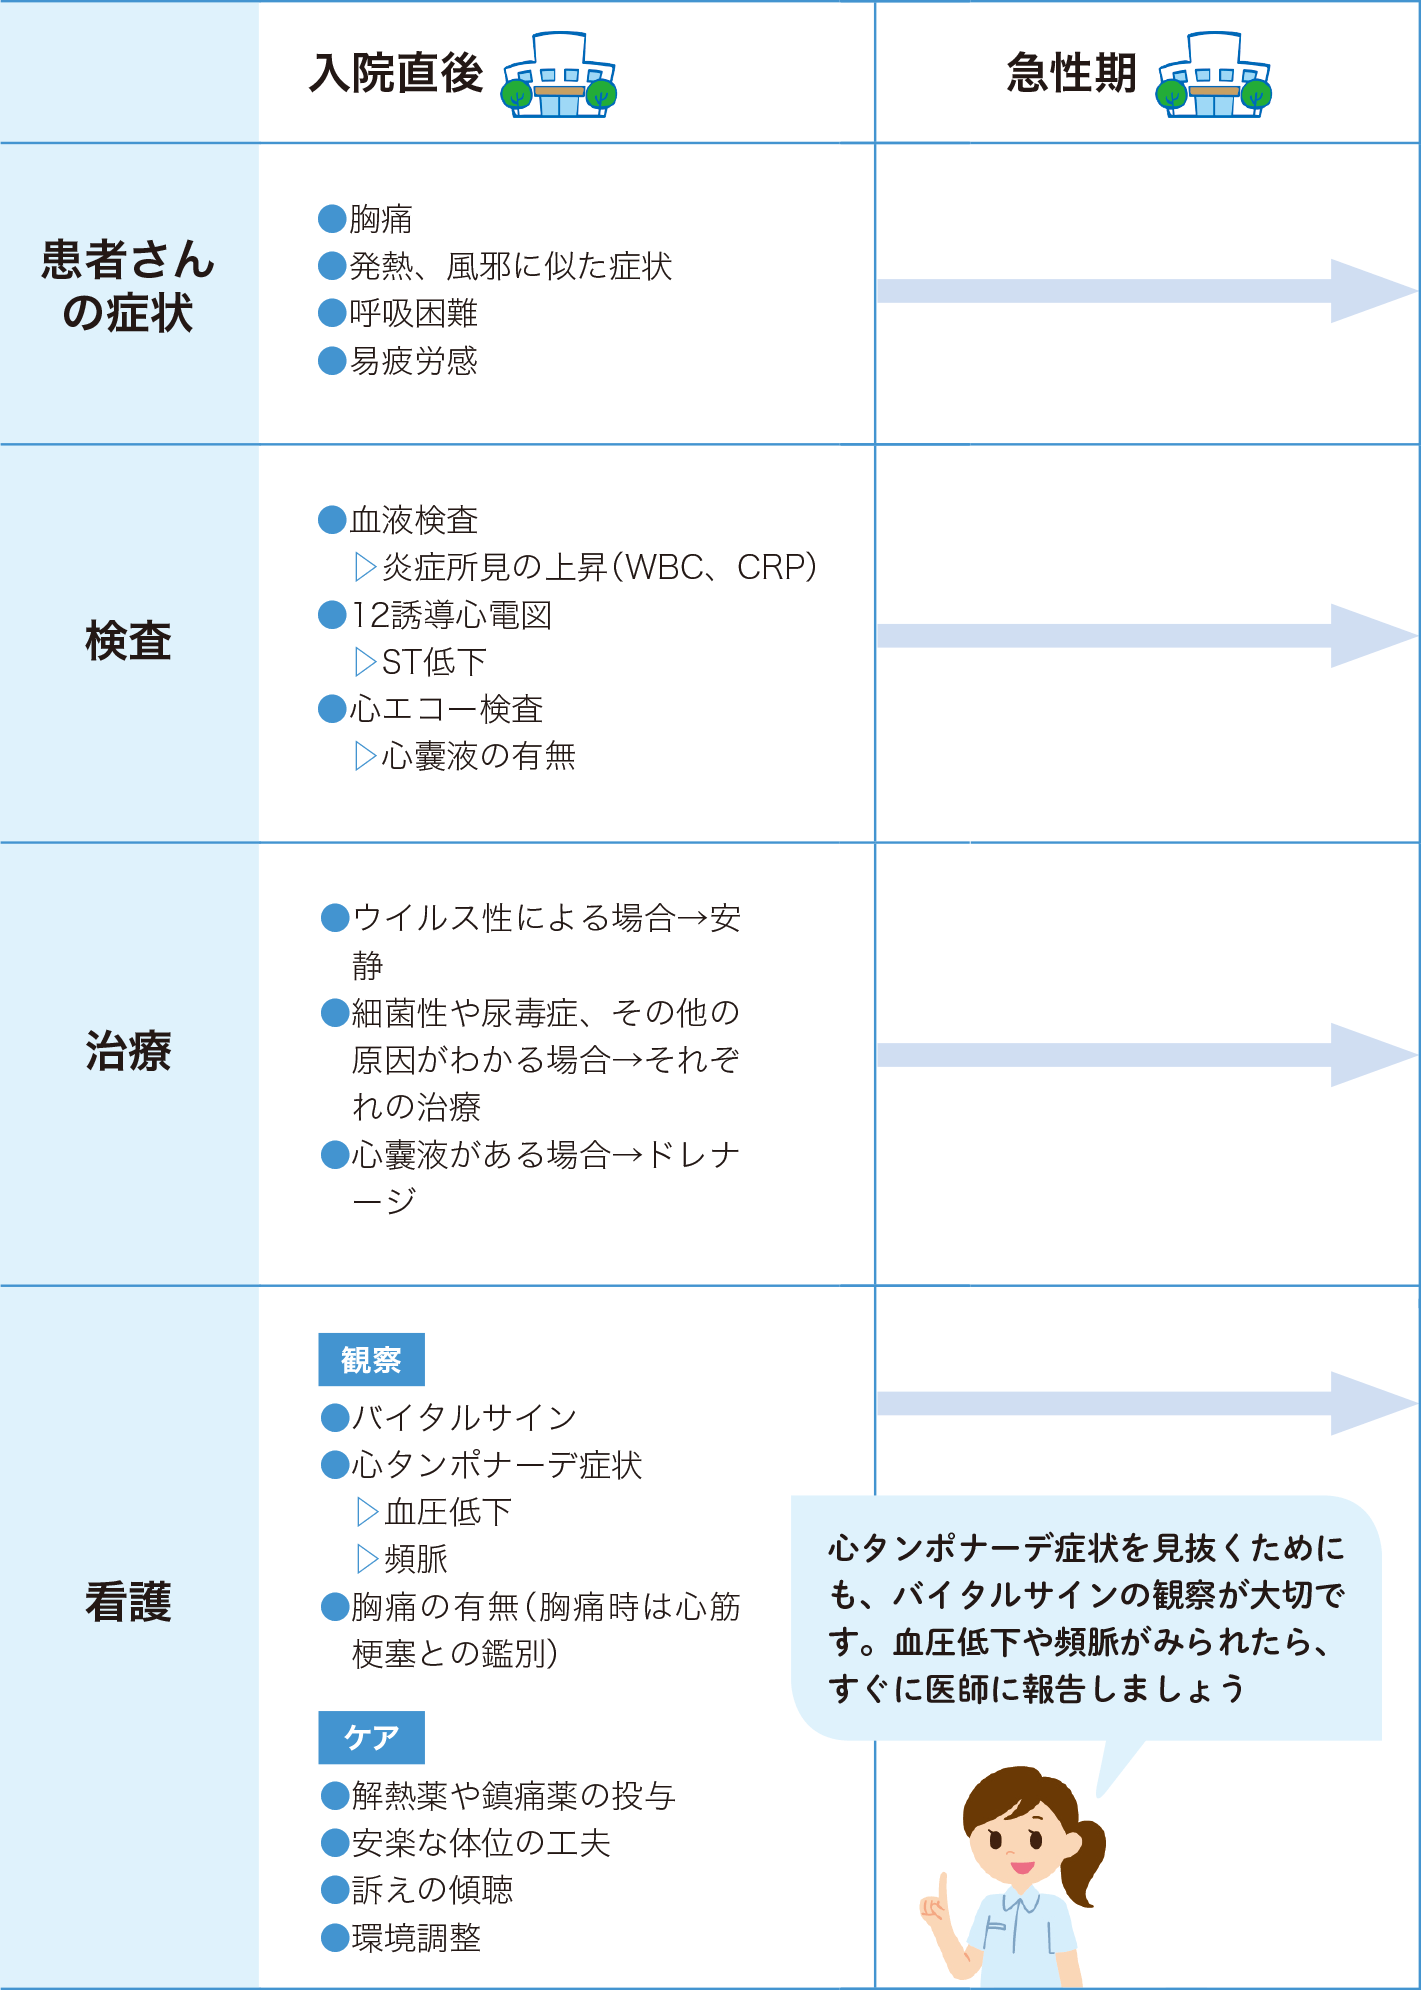 急性心膜炎の看護 入院直後・急性期